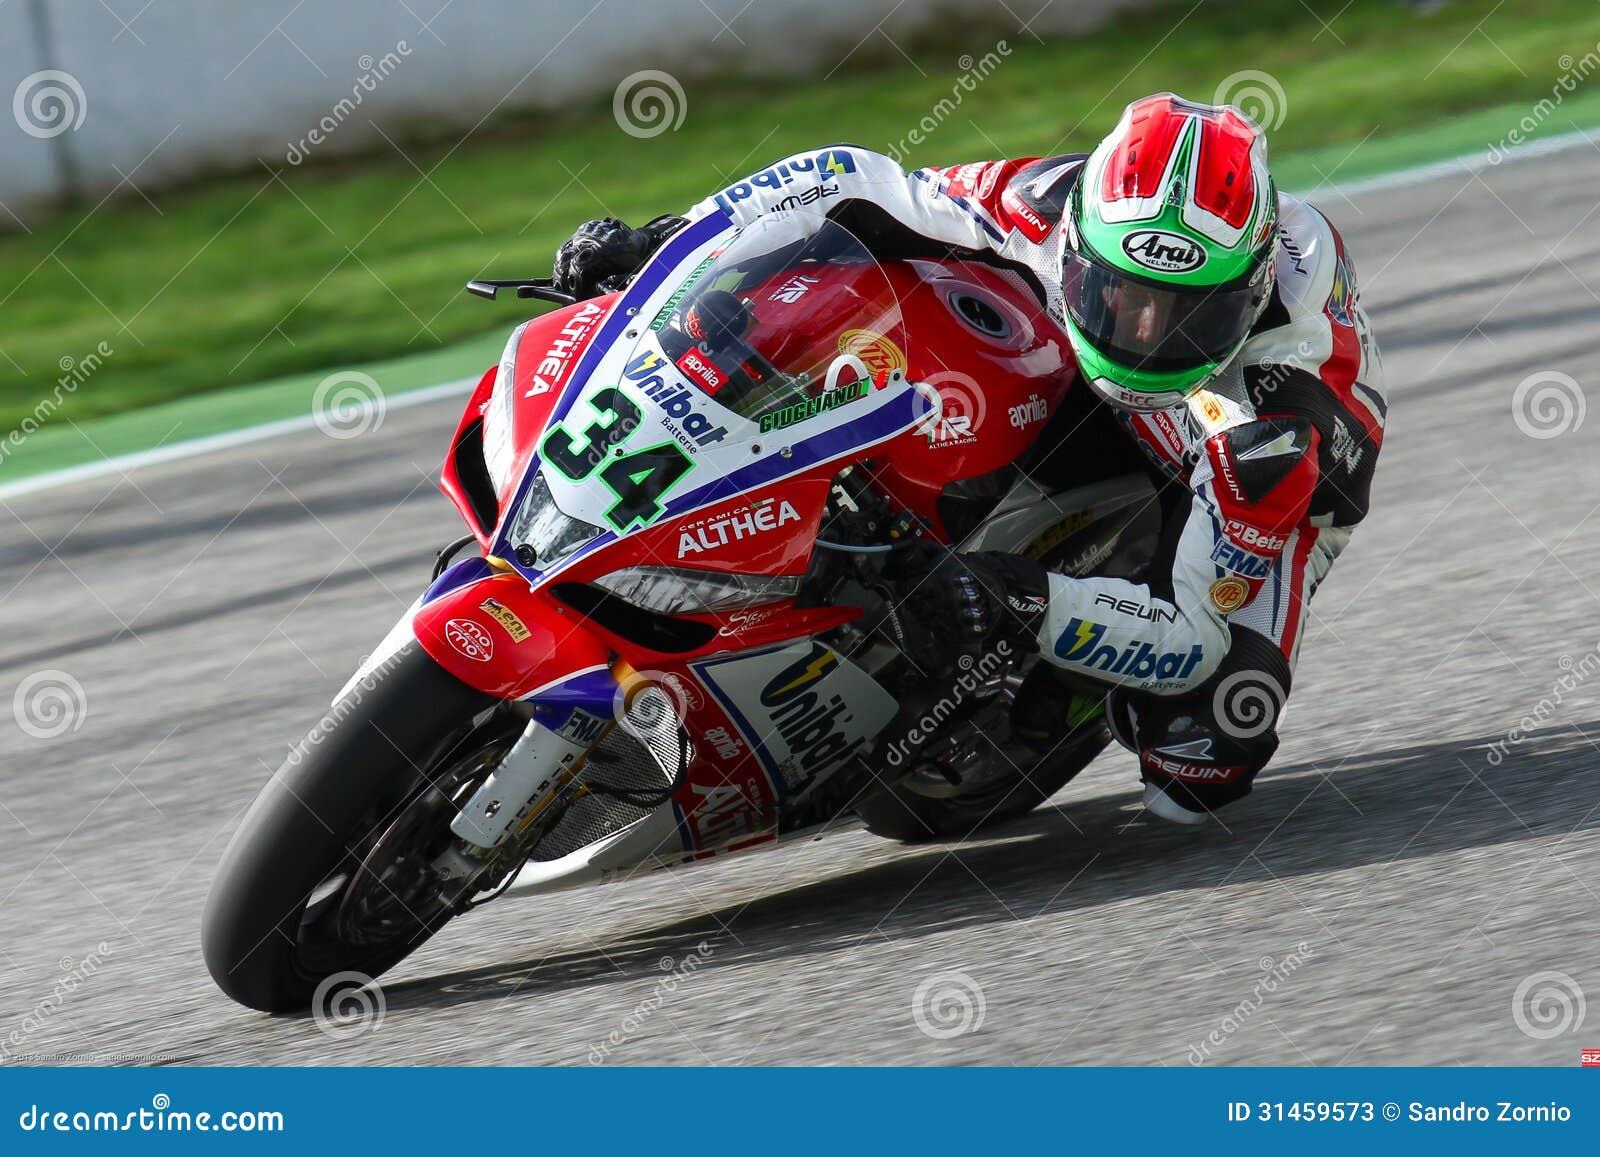 Davide Giugliano #34 on Aprilia RSV4 1000 Factory with Althea Racing Team Superbike WSBK